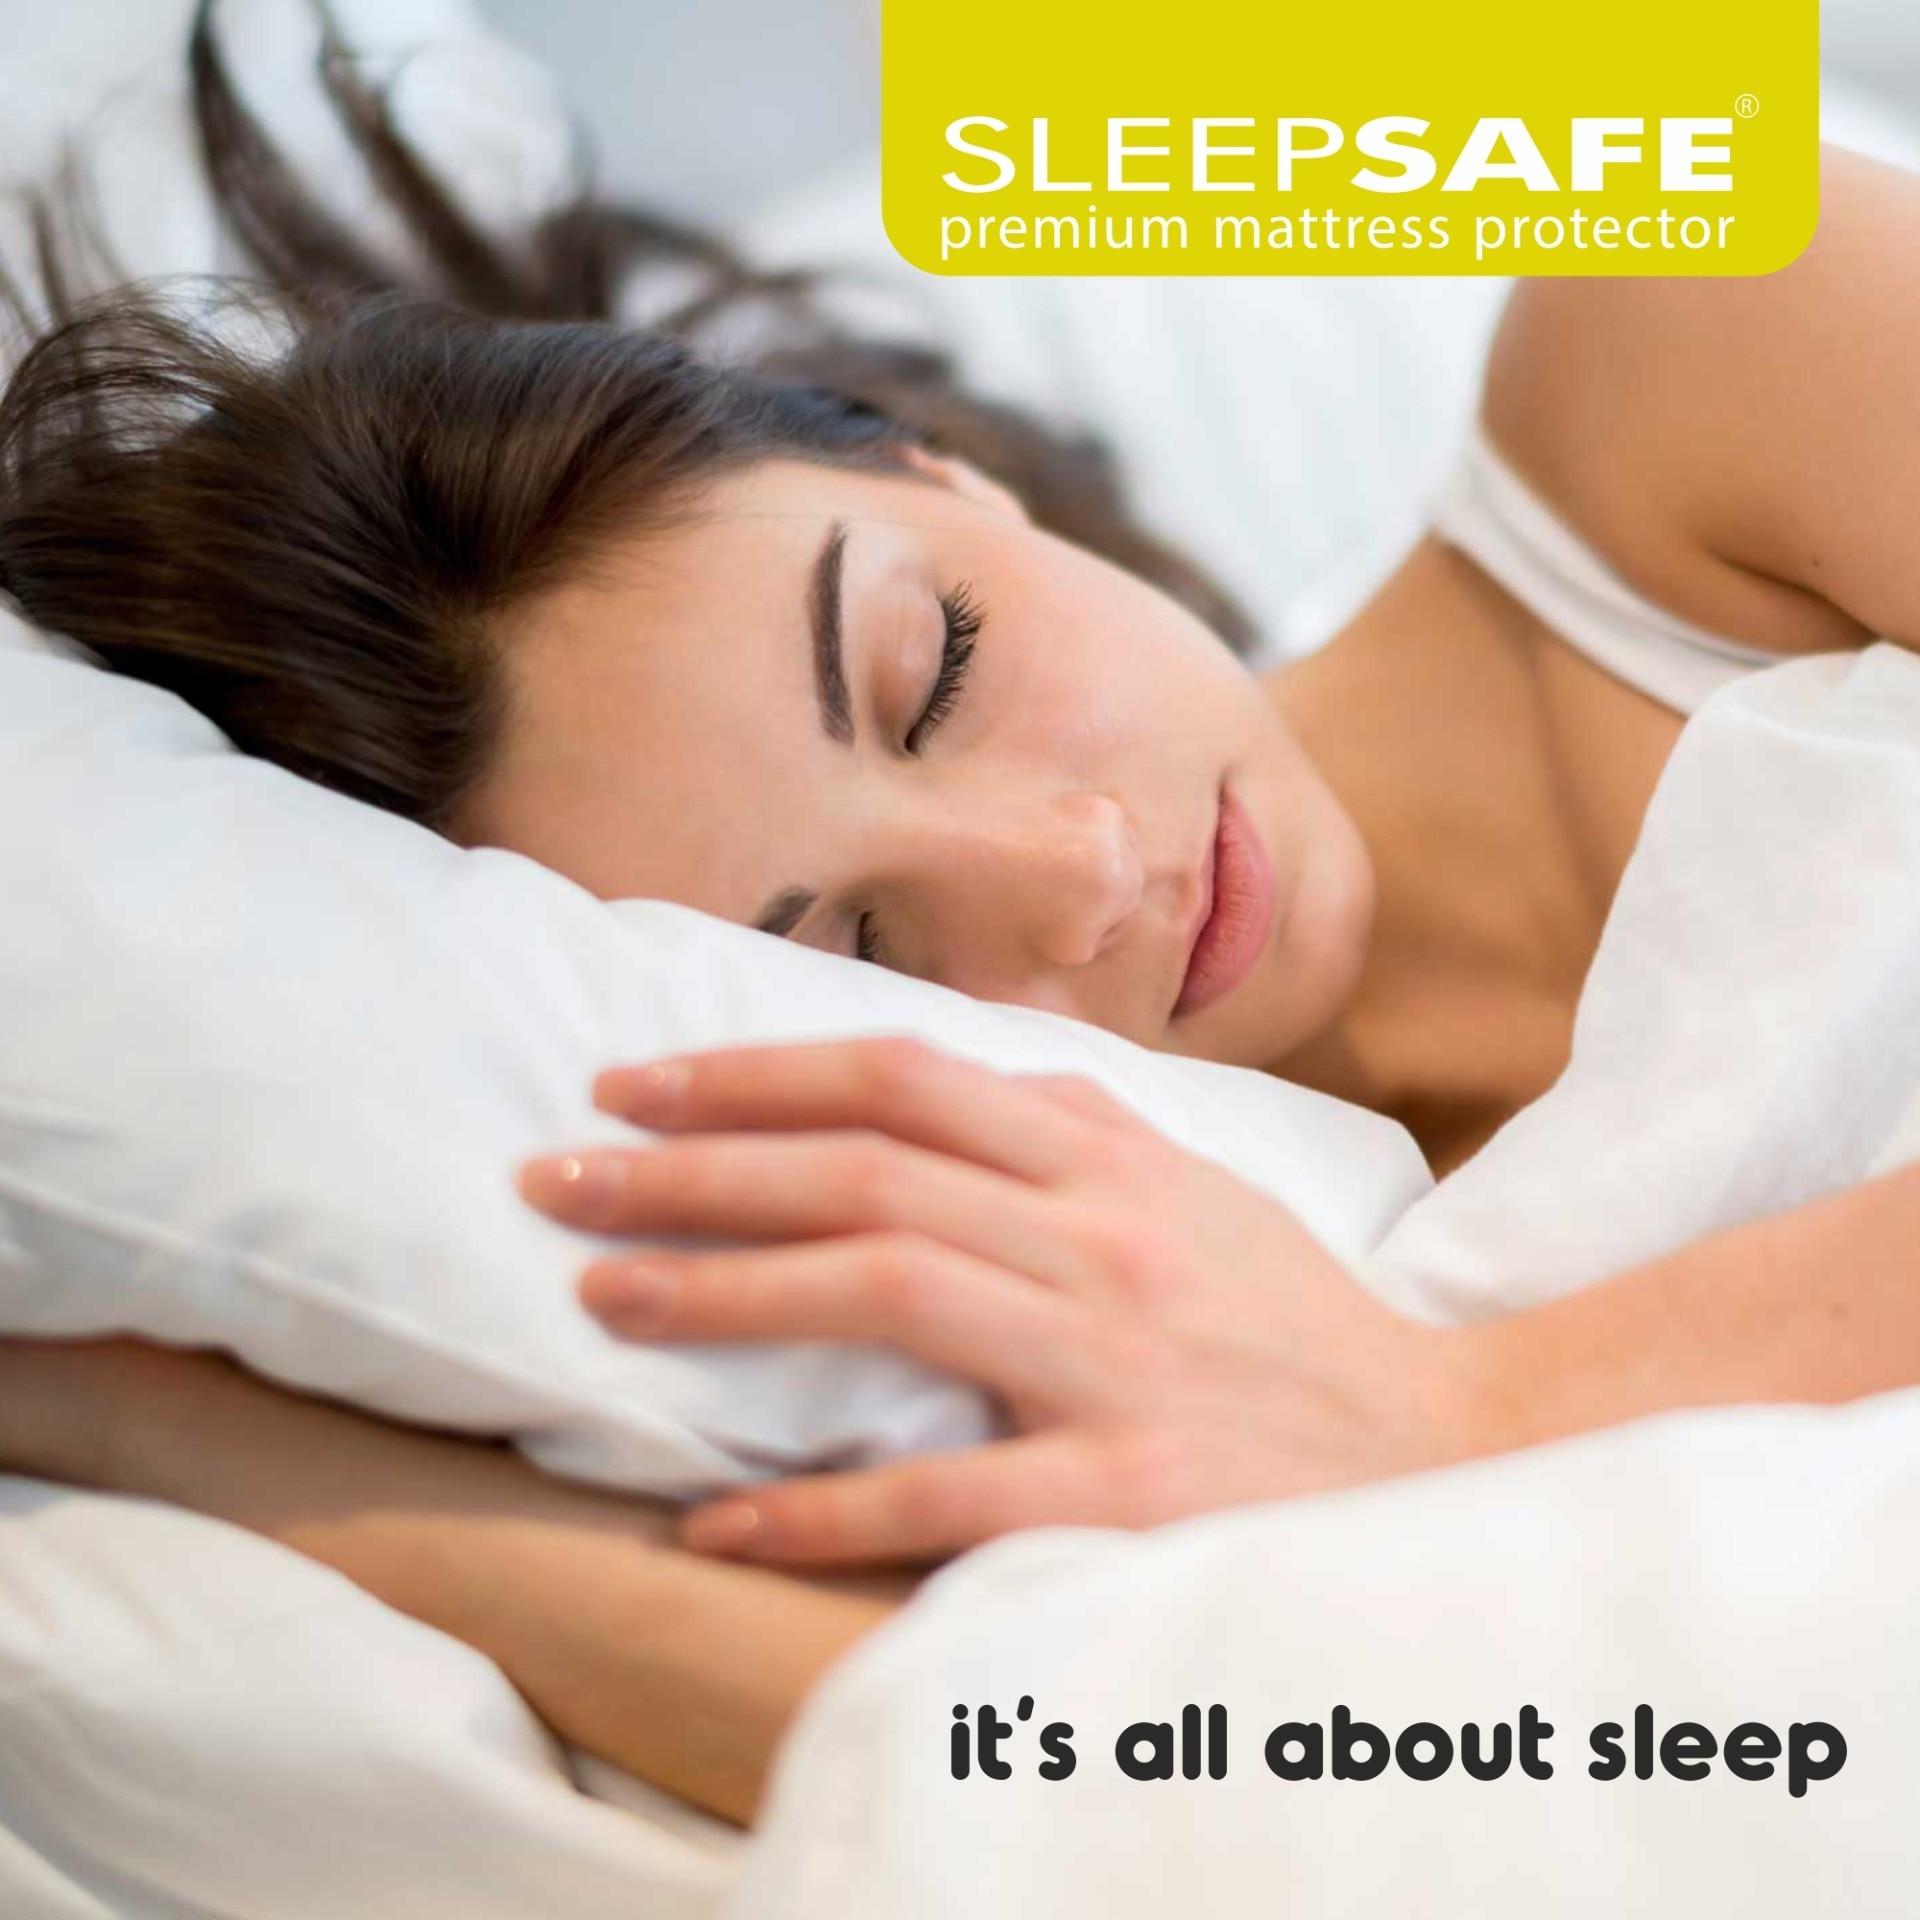 Sleepsafe Waterproof Mattress Protectors